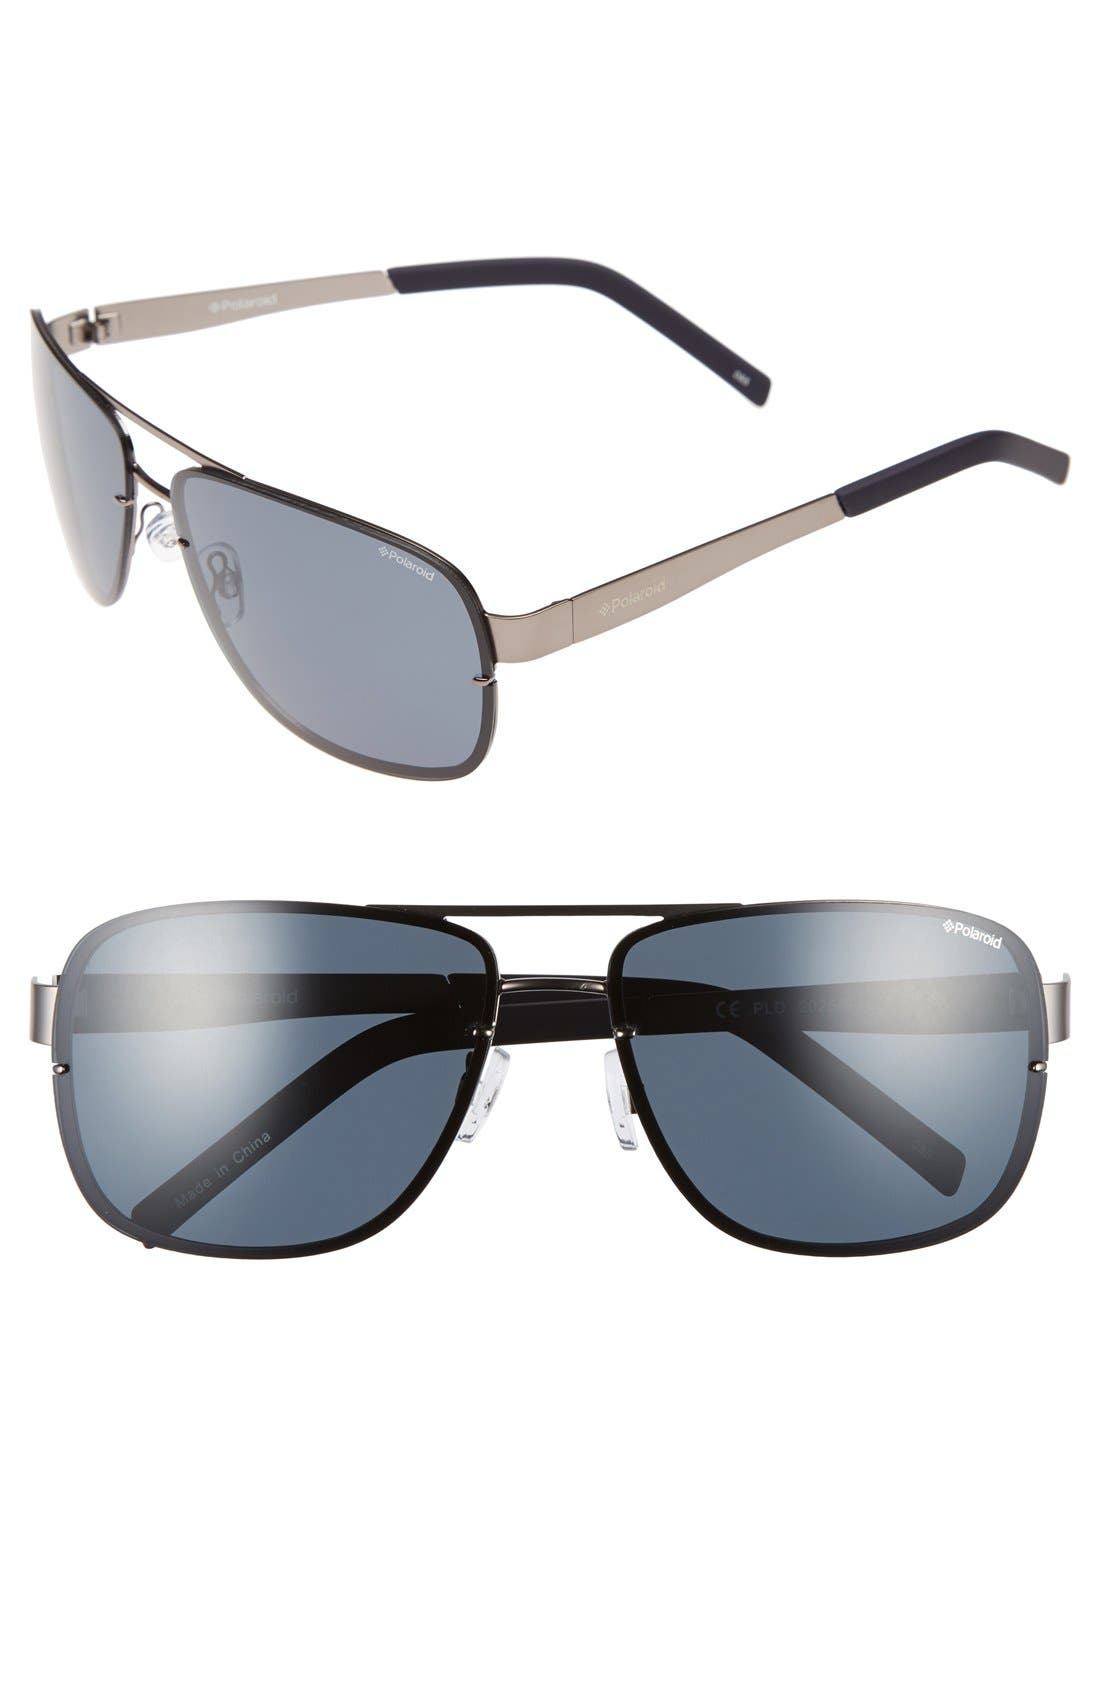 POLAROID EYEWEAR 2025/S 63mm Polarized Sunglasses